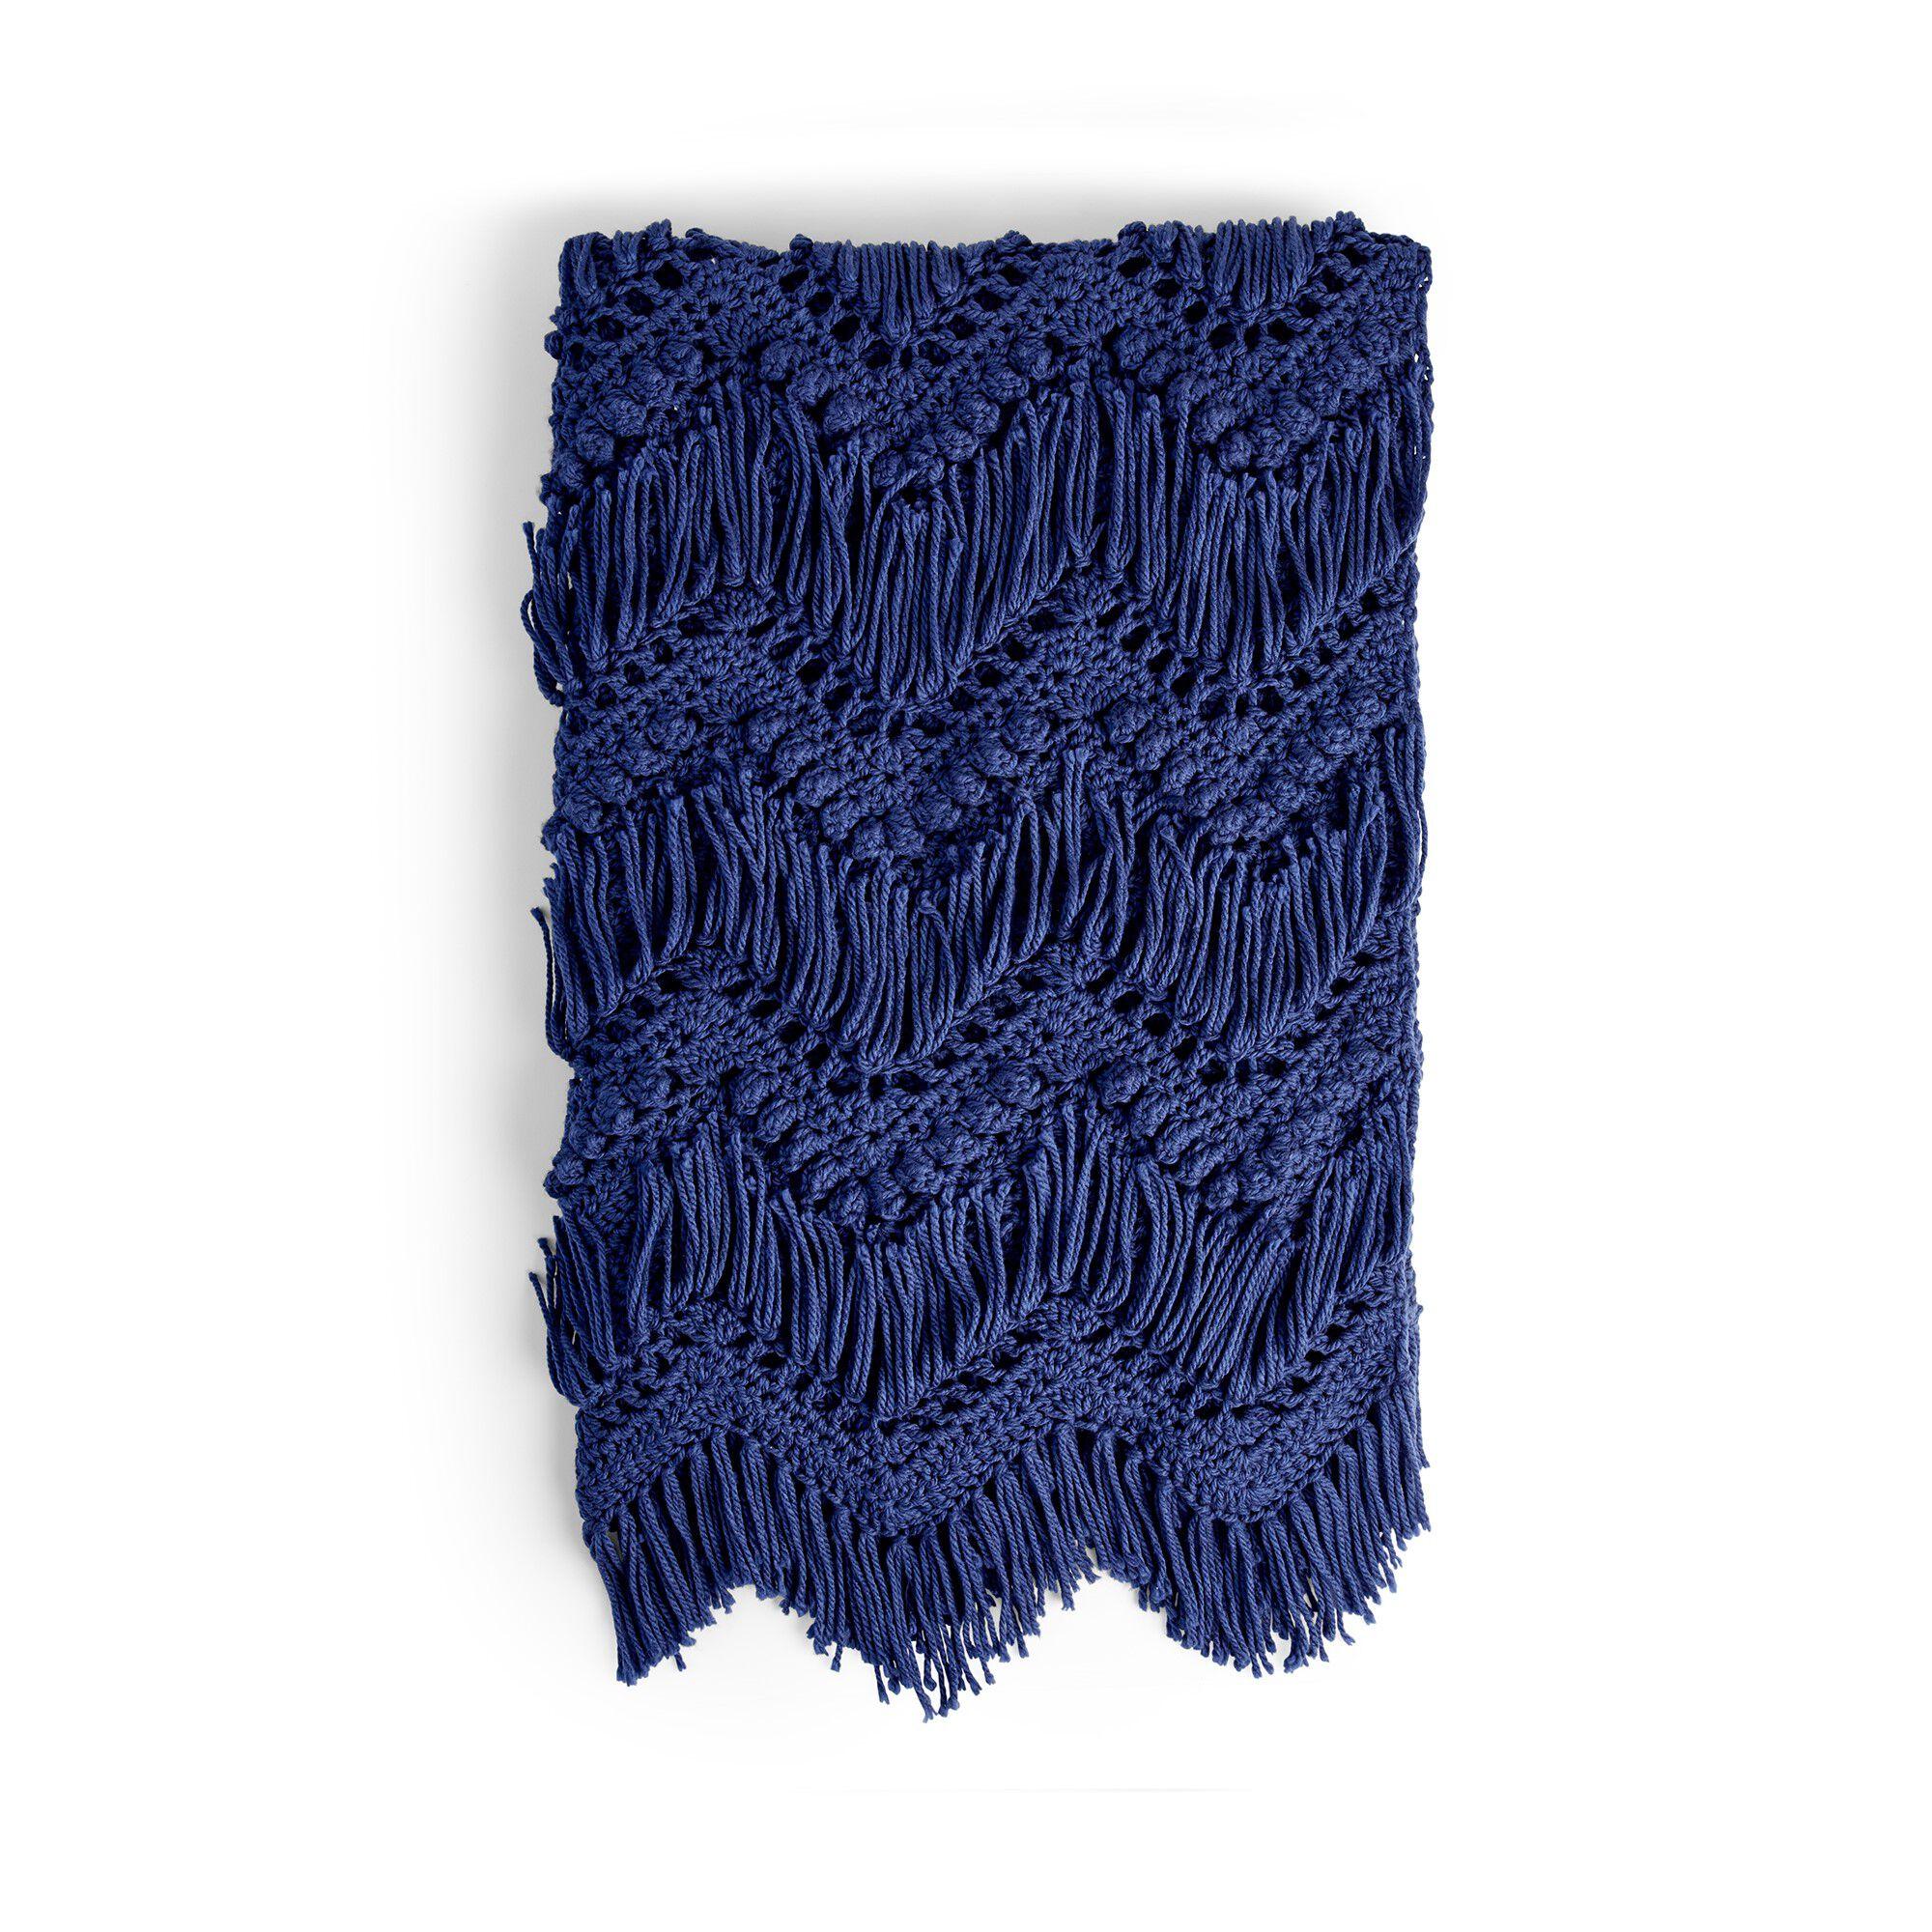 Bernat Bobble and Fringe Blanket Pattern | Yarnspirations